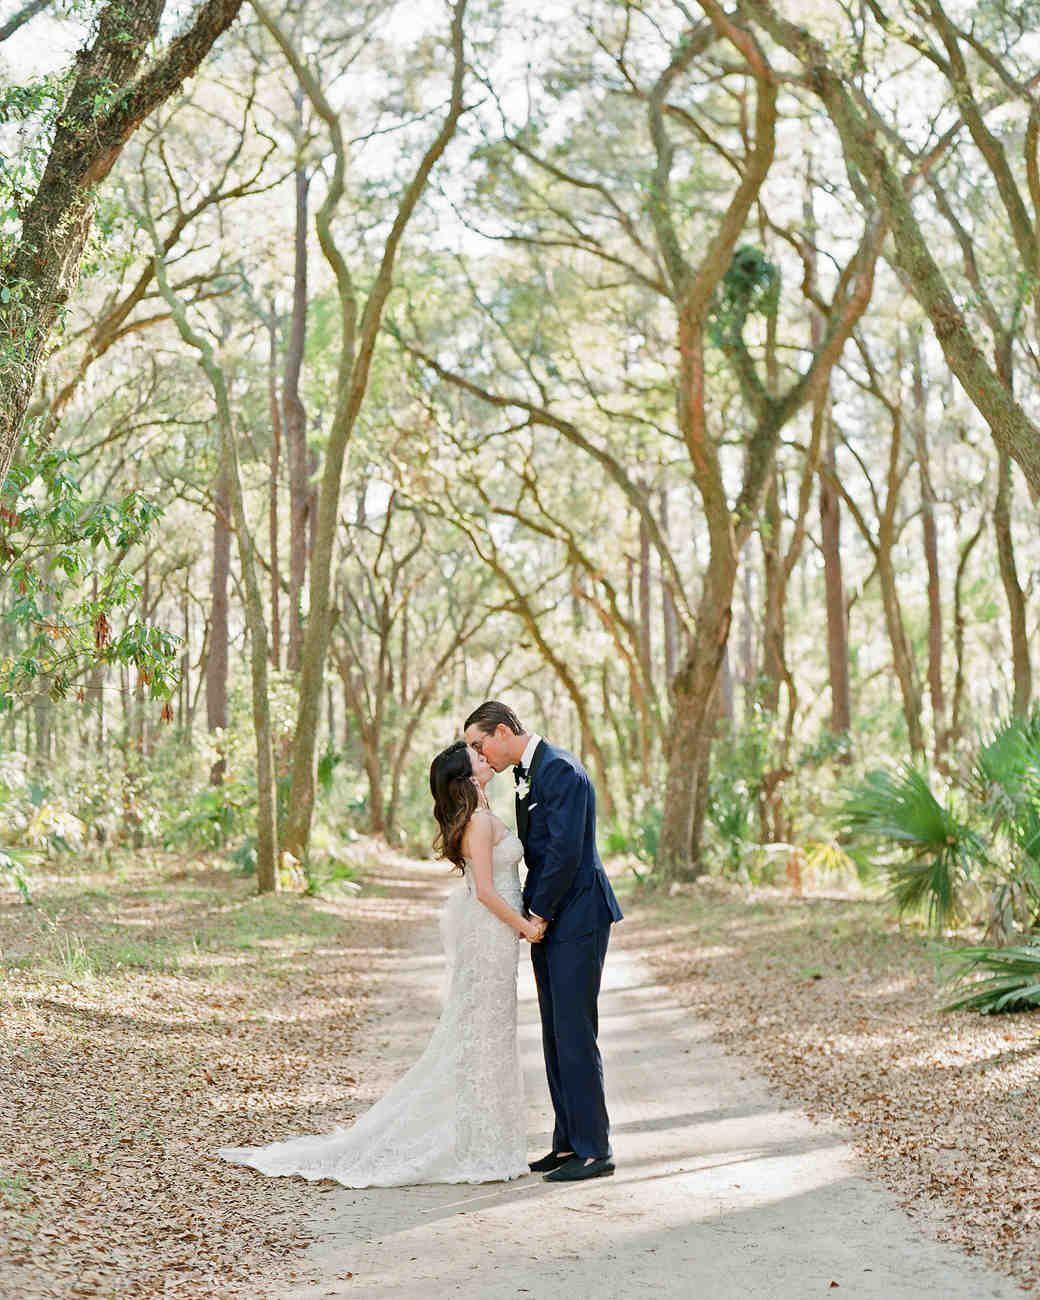 A Charming Colorful South Carolina Wedding Oak Tree Wedding Amazing Wedding Photos Wedding Photo Books